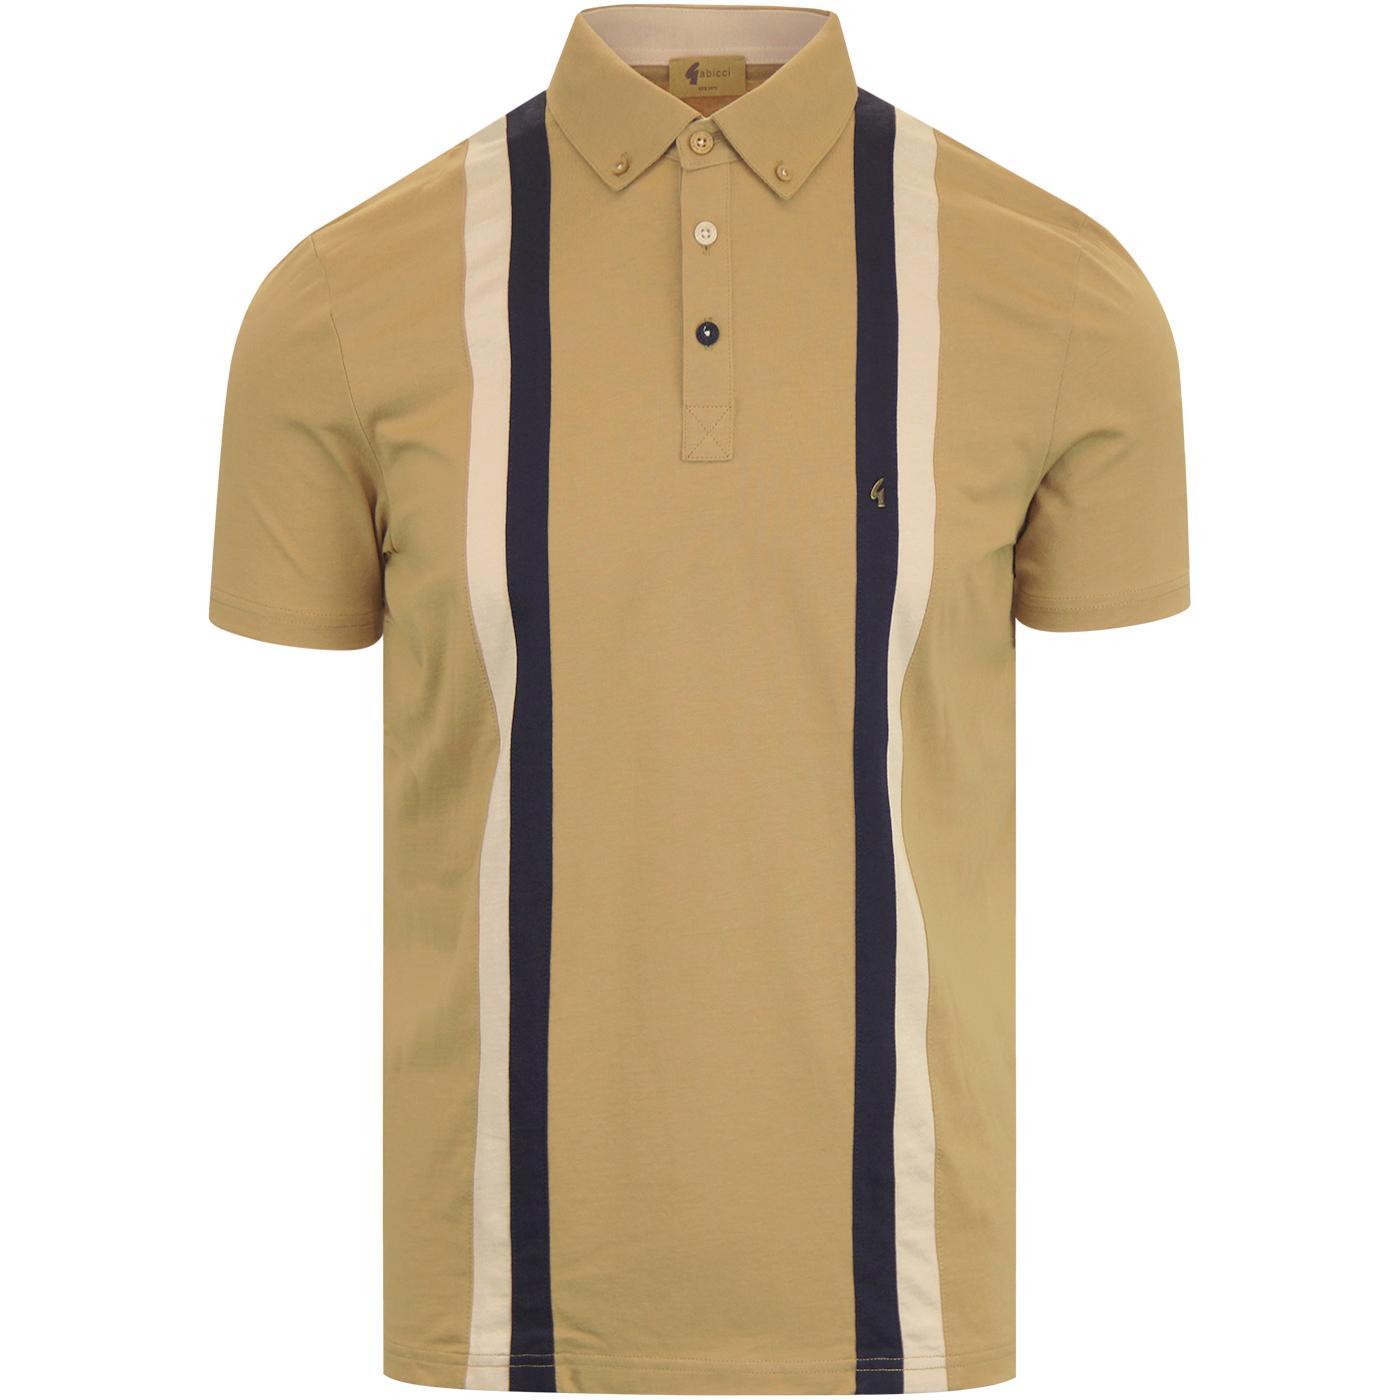 Dale GABICCI VINTAGE Contrast Stripe Jersey Polo